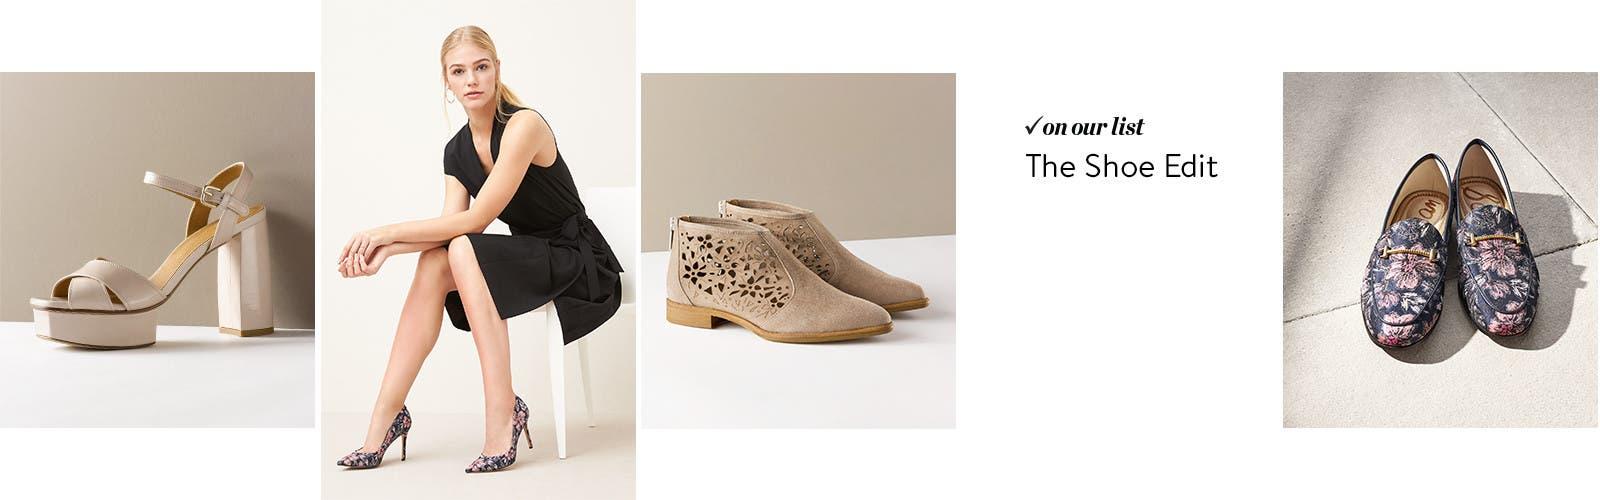 Women's heels, women's boots, women's sandals and women's flats.